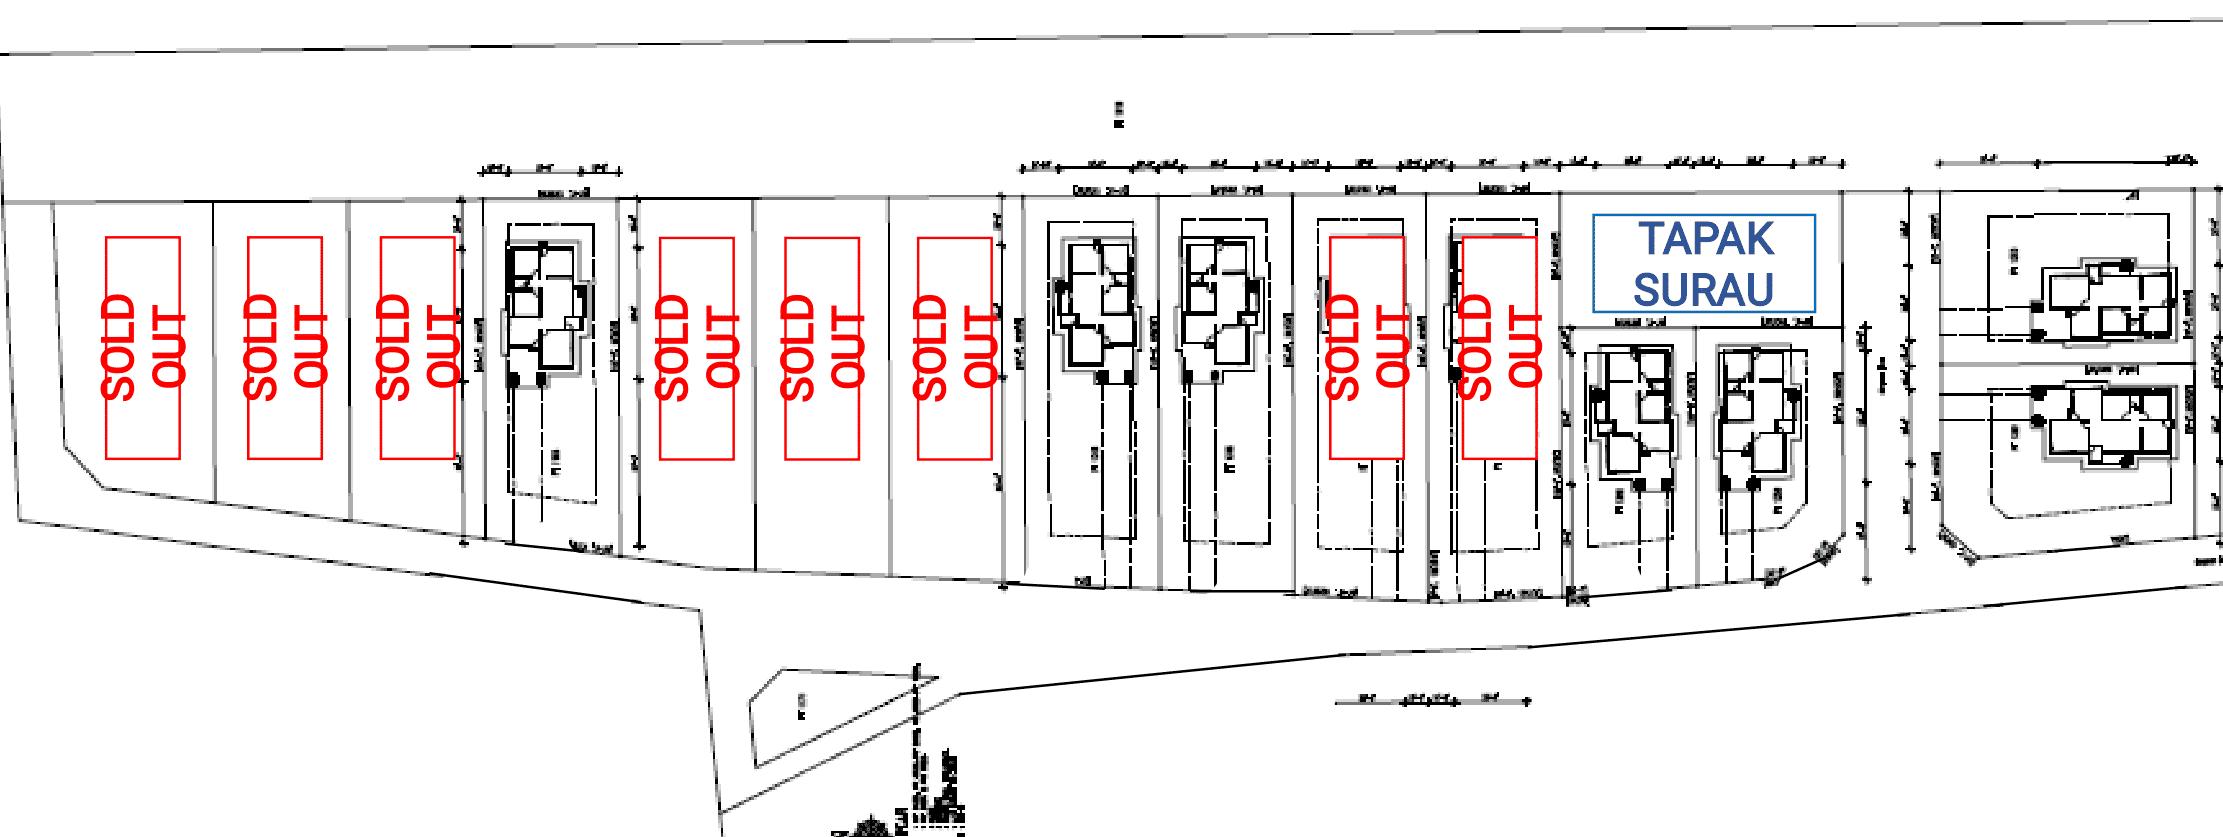 Mukim Jabo 28